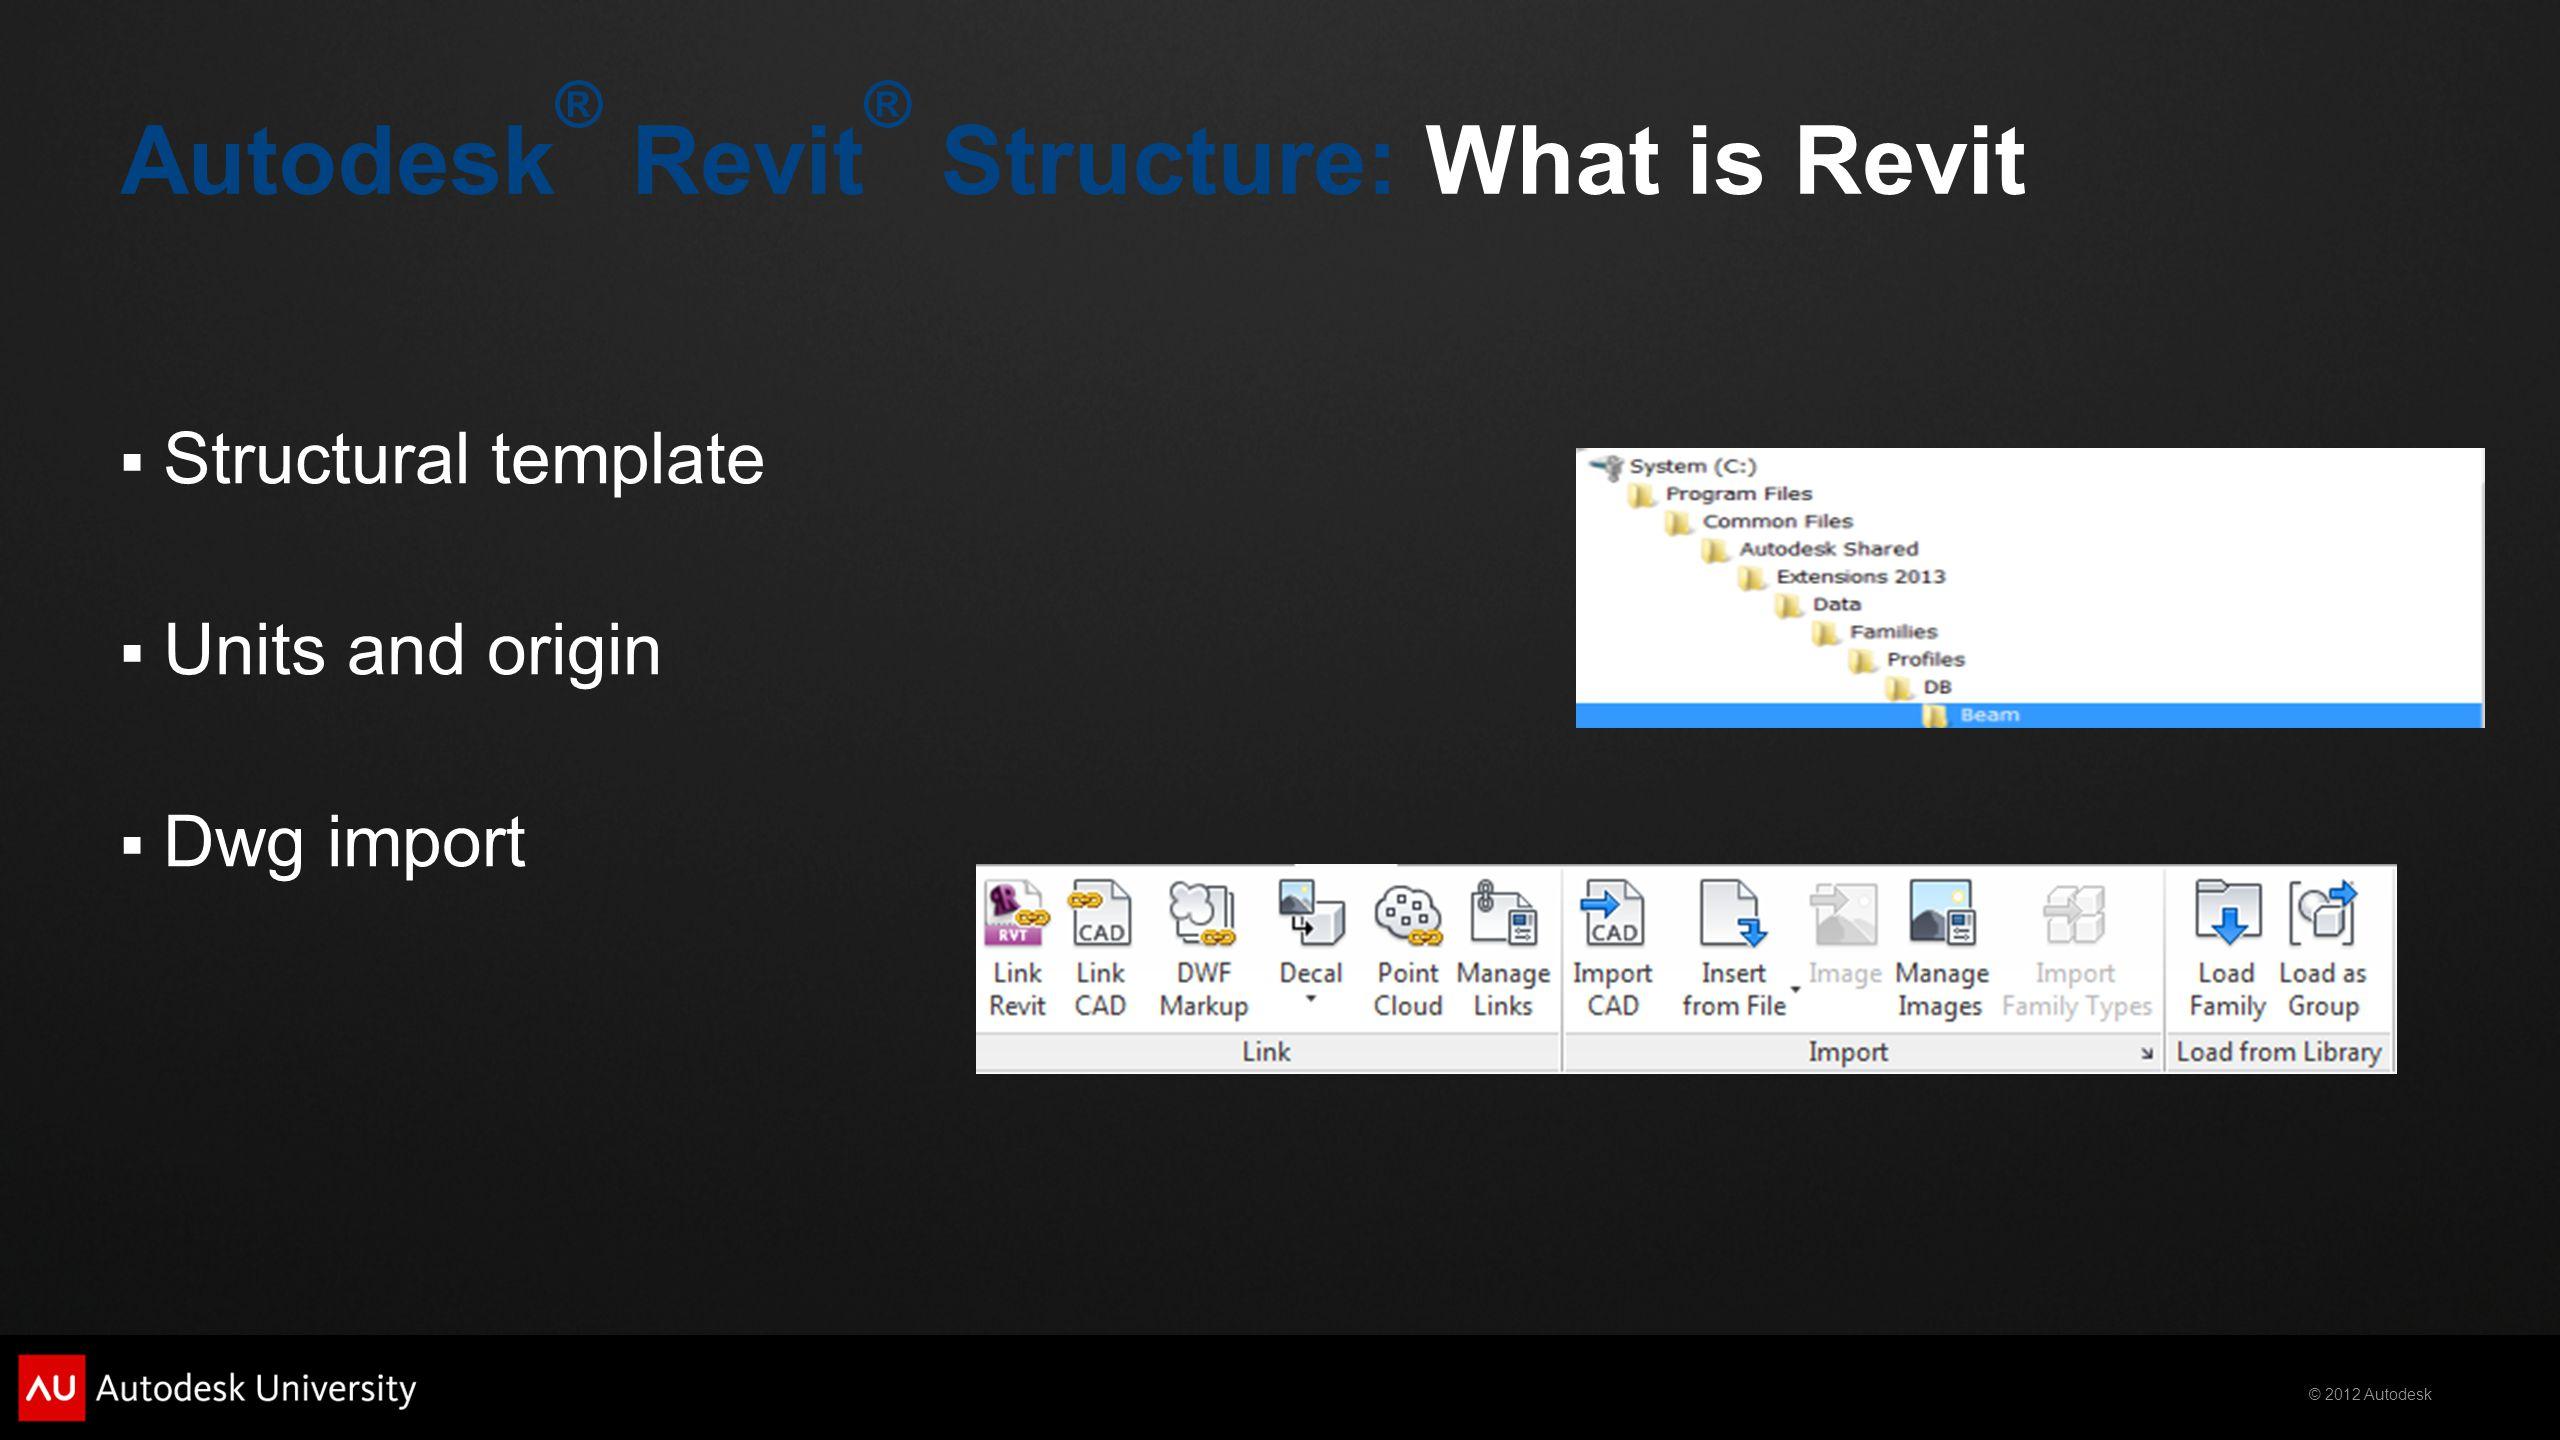 © 2012 Autodesk Autodesk ® Revit ® Structure: What is Revit  Structural template  Units and origin  Dwg import